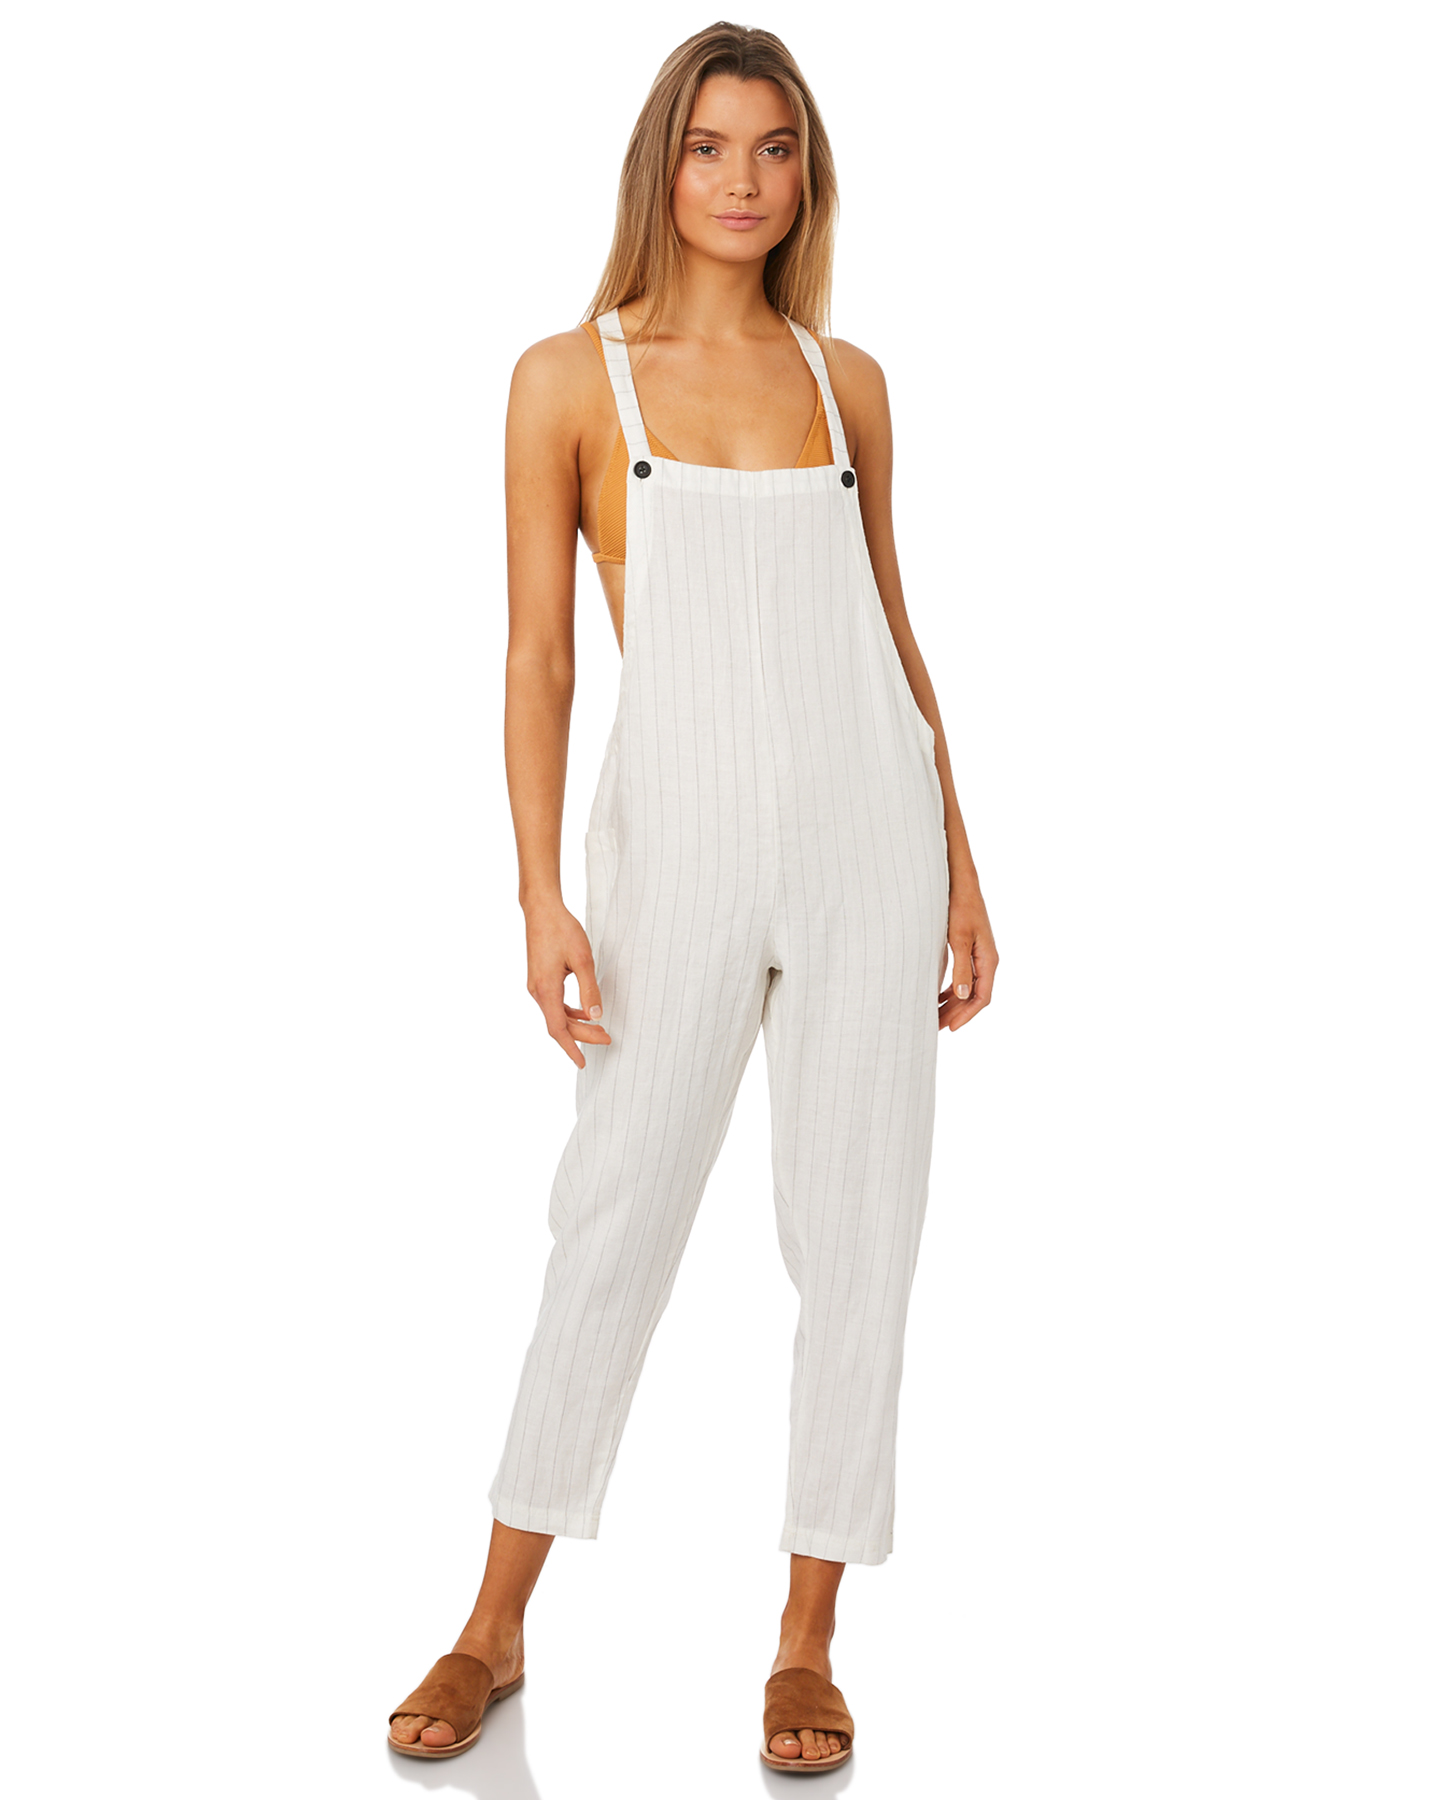 eaedd286e1a New Rhythm Women s Catalina Jumpsuit Linen White 6